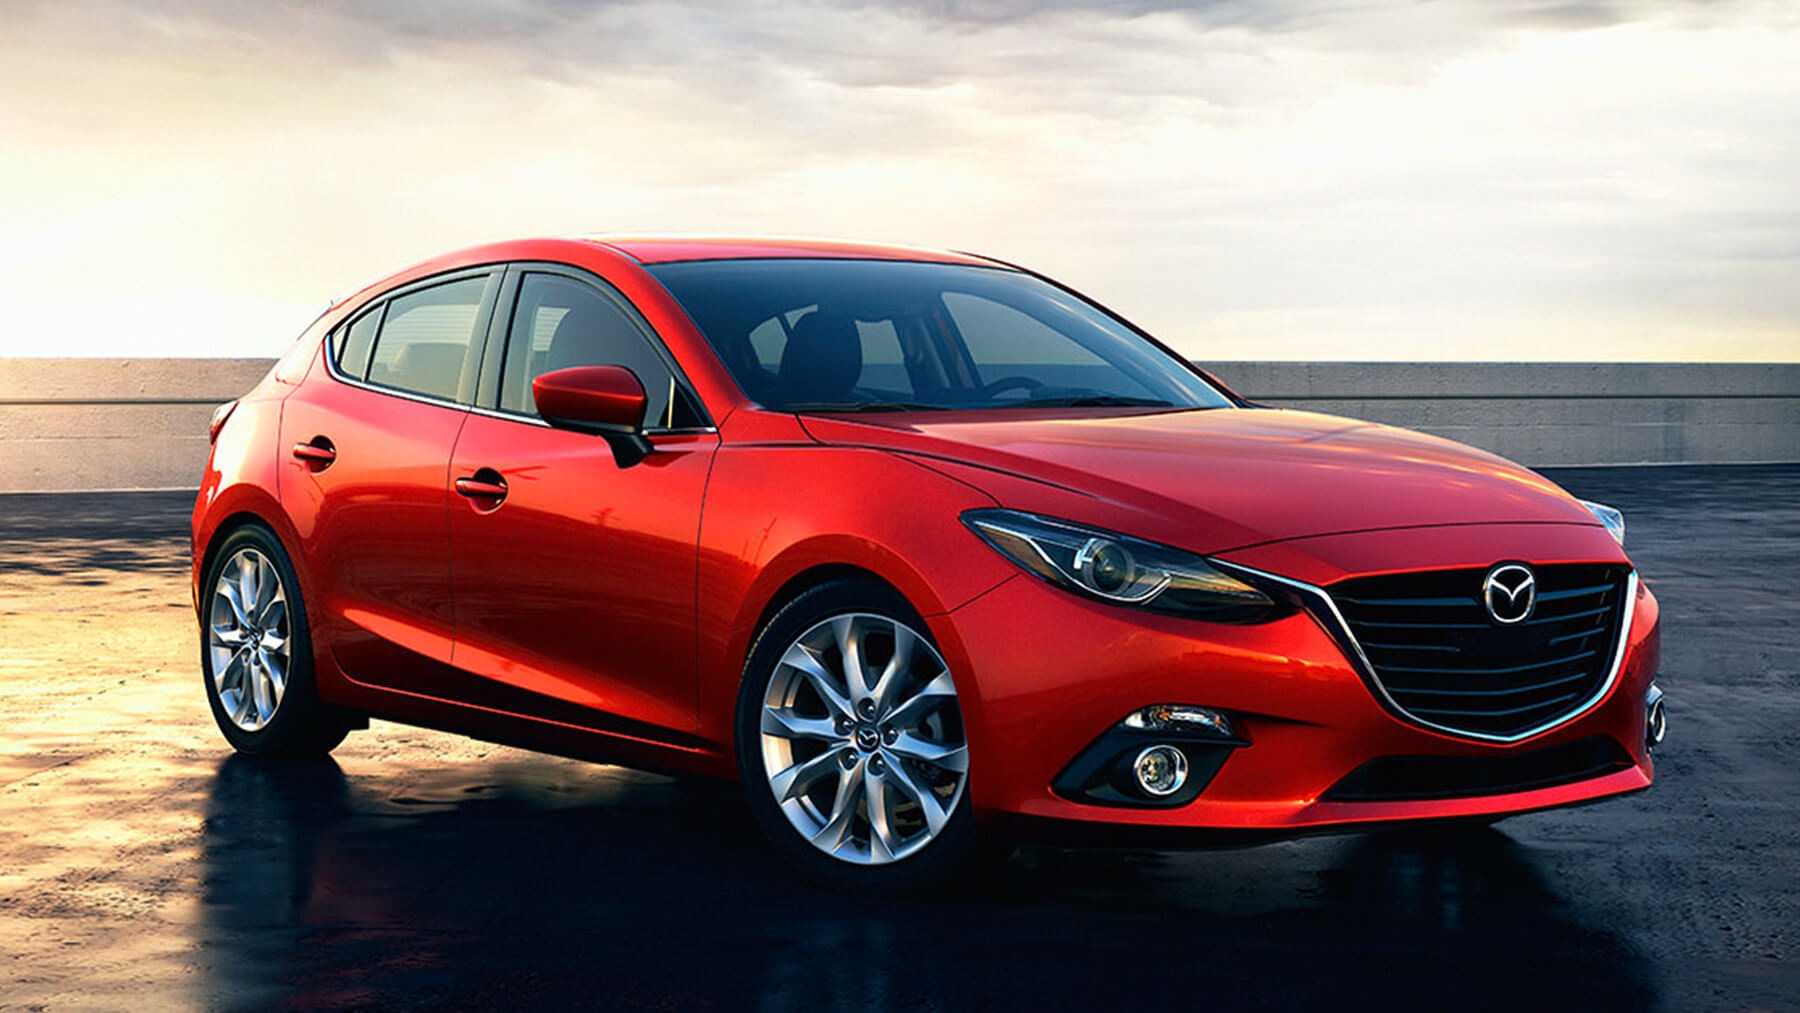 2016 Mazda3 Hatchback - Pictures & Videos